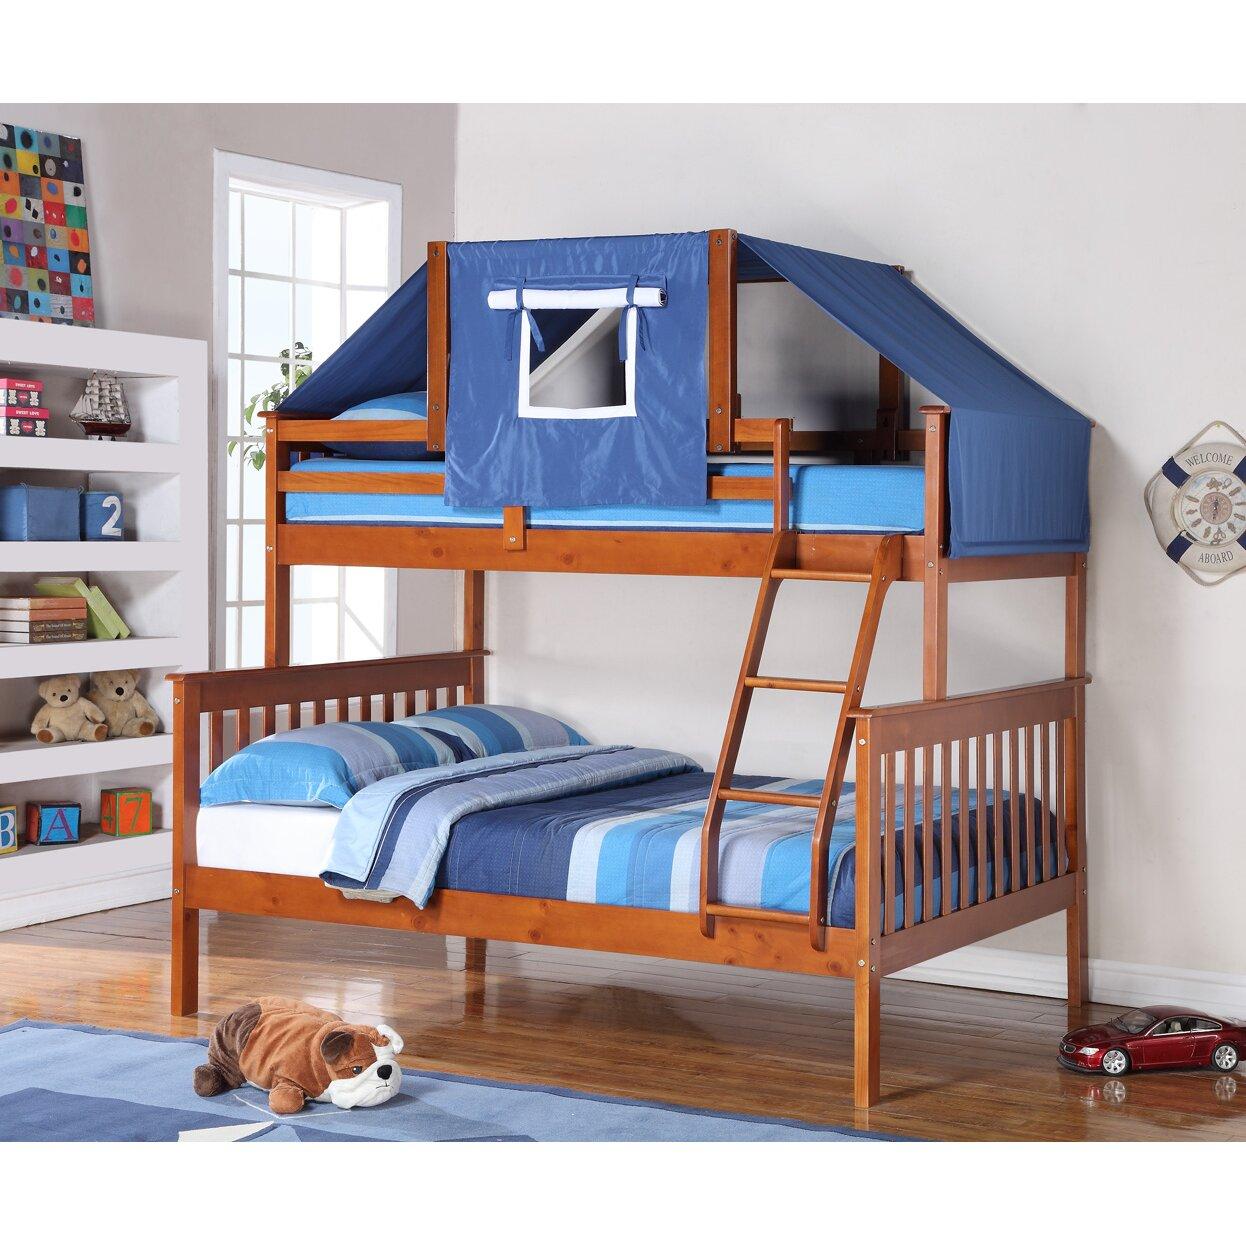 donco kids donco kids twin over full futon bunk bed. Black Bedroom Furniture Sets. Home Design Ideas